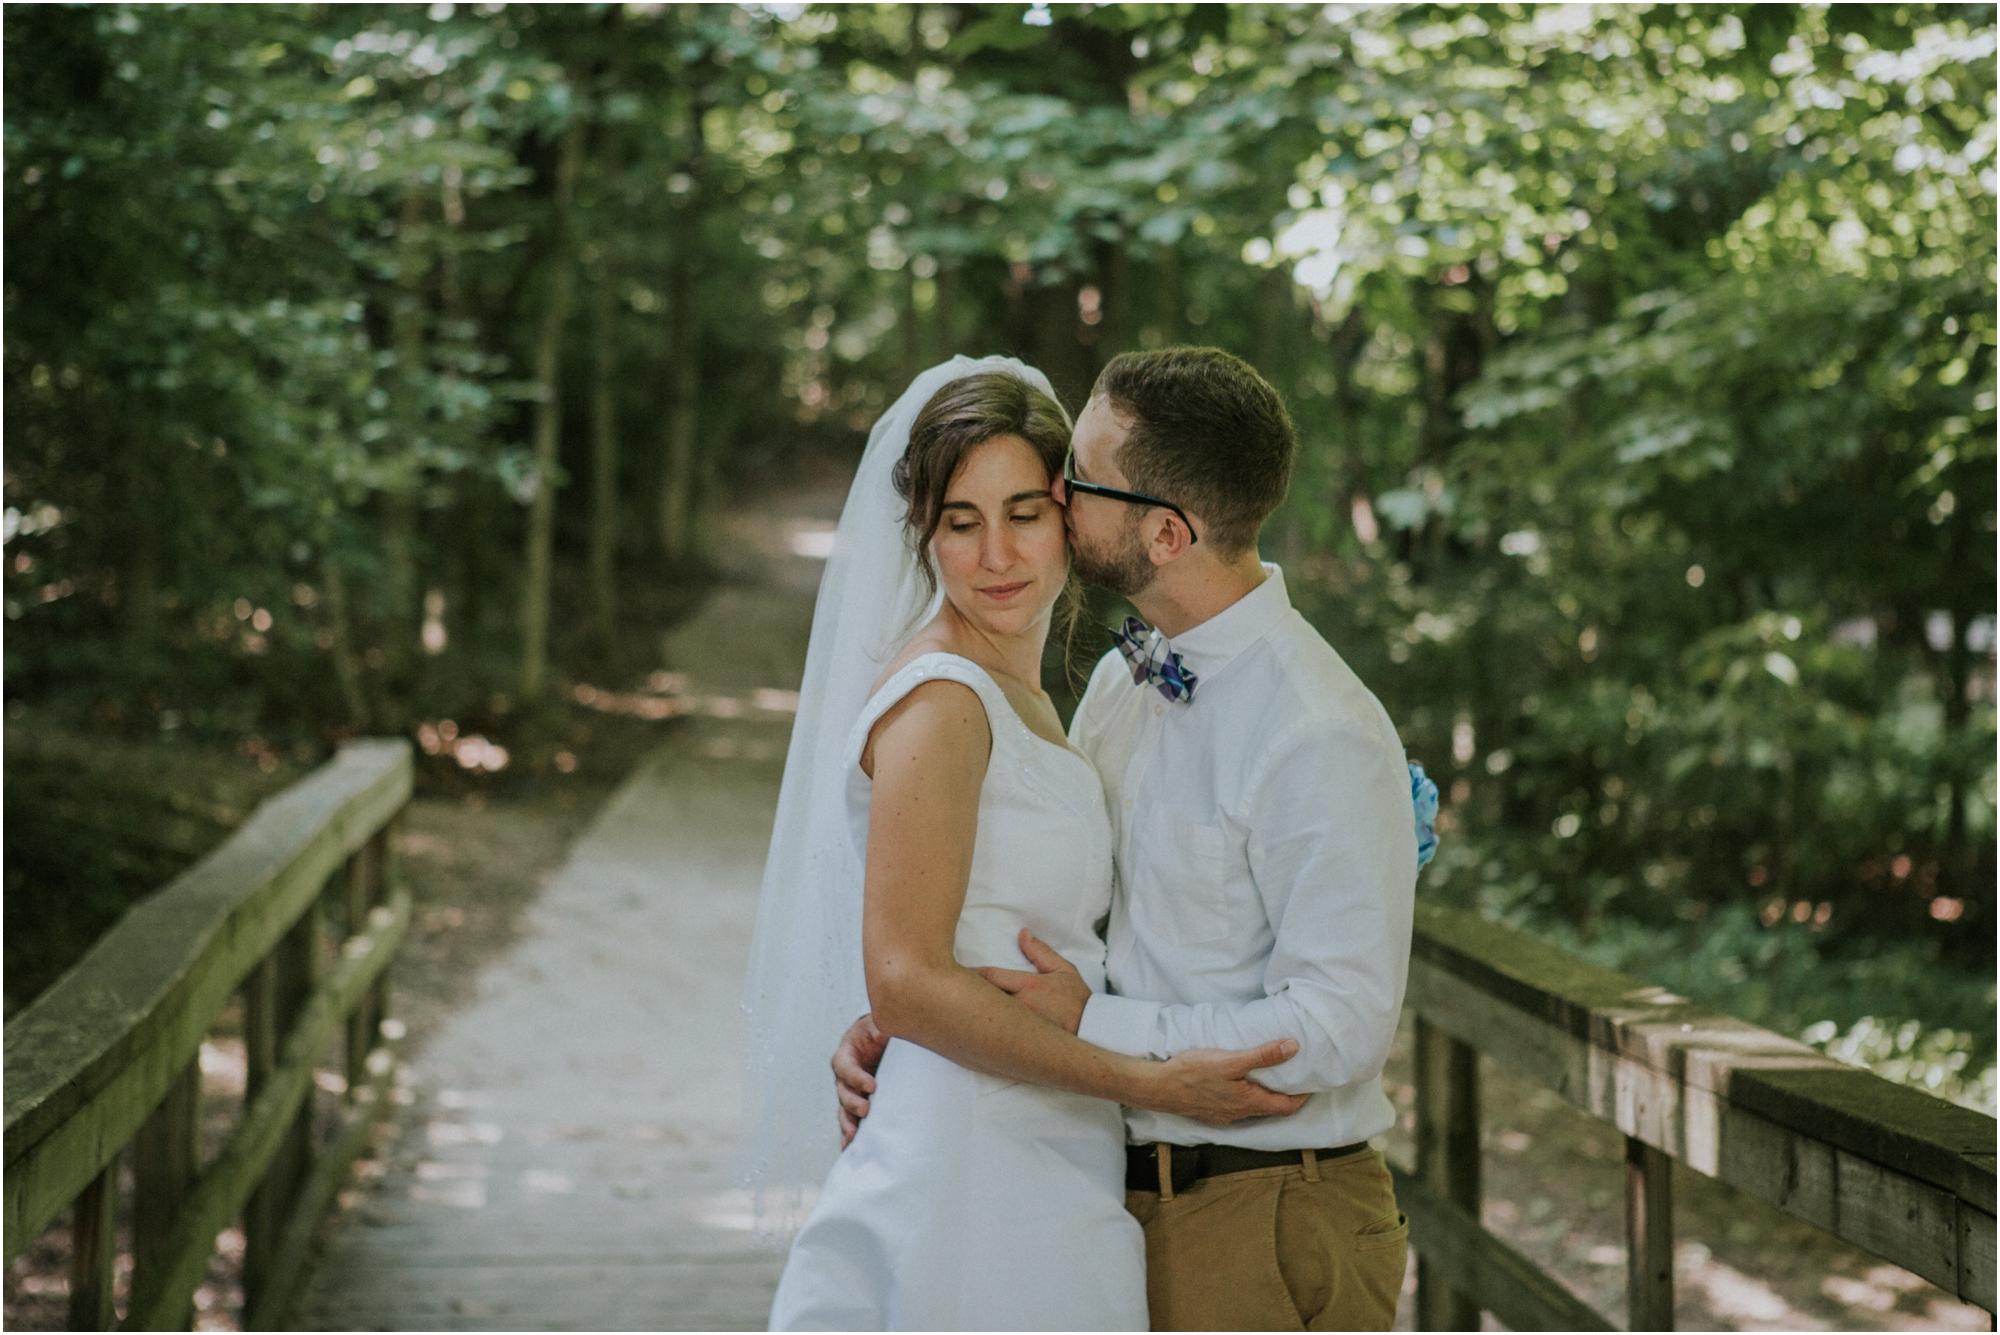 sugar-hollow-park-bristol-virginia-wedding-intimate-woodsy-black-forest-ceremony-adventurous-couple_0060.jpg